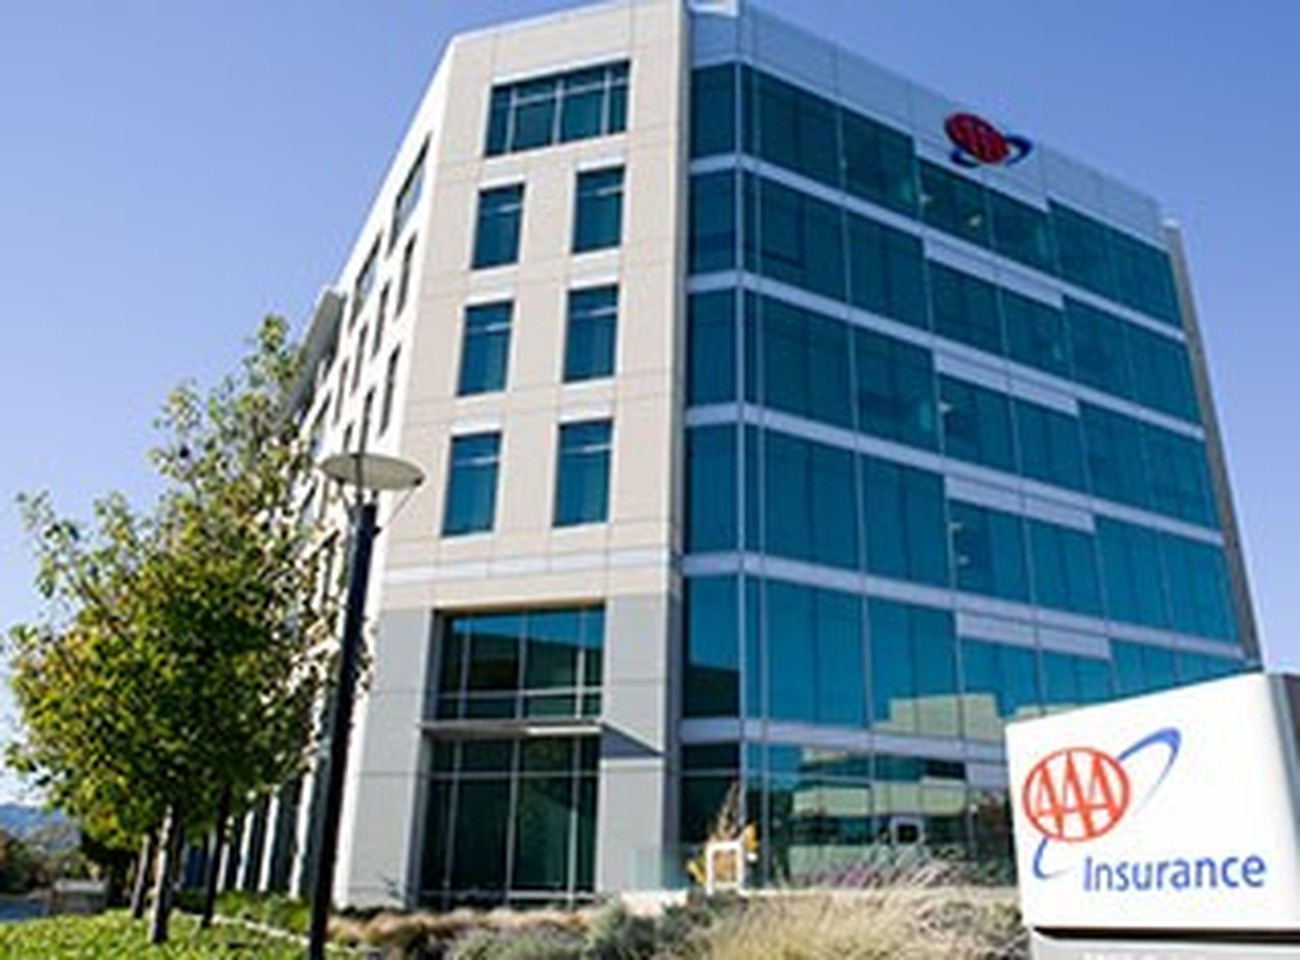 CSAA Insurance Group Careers